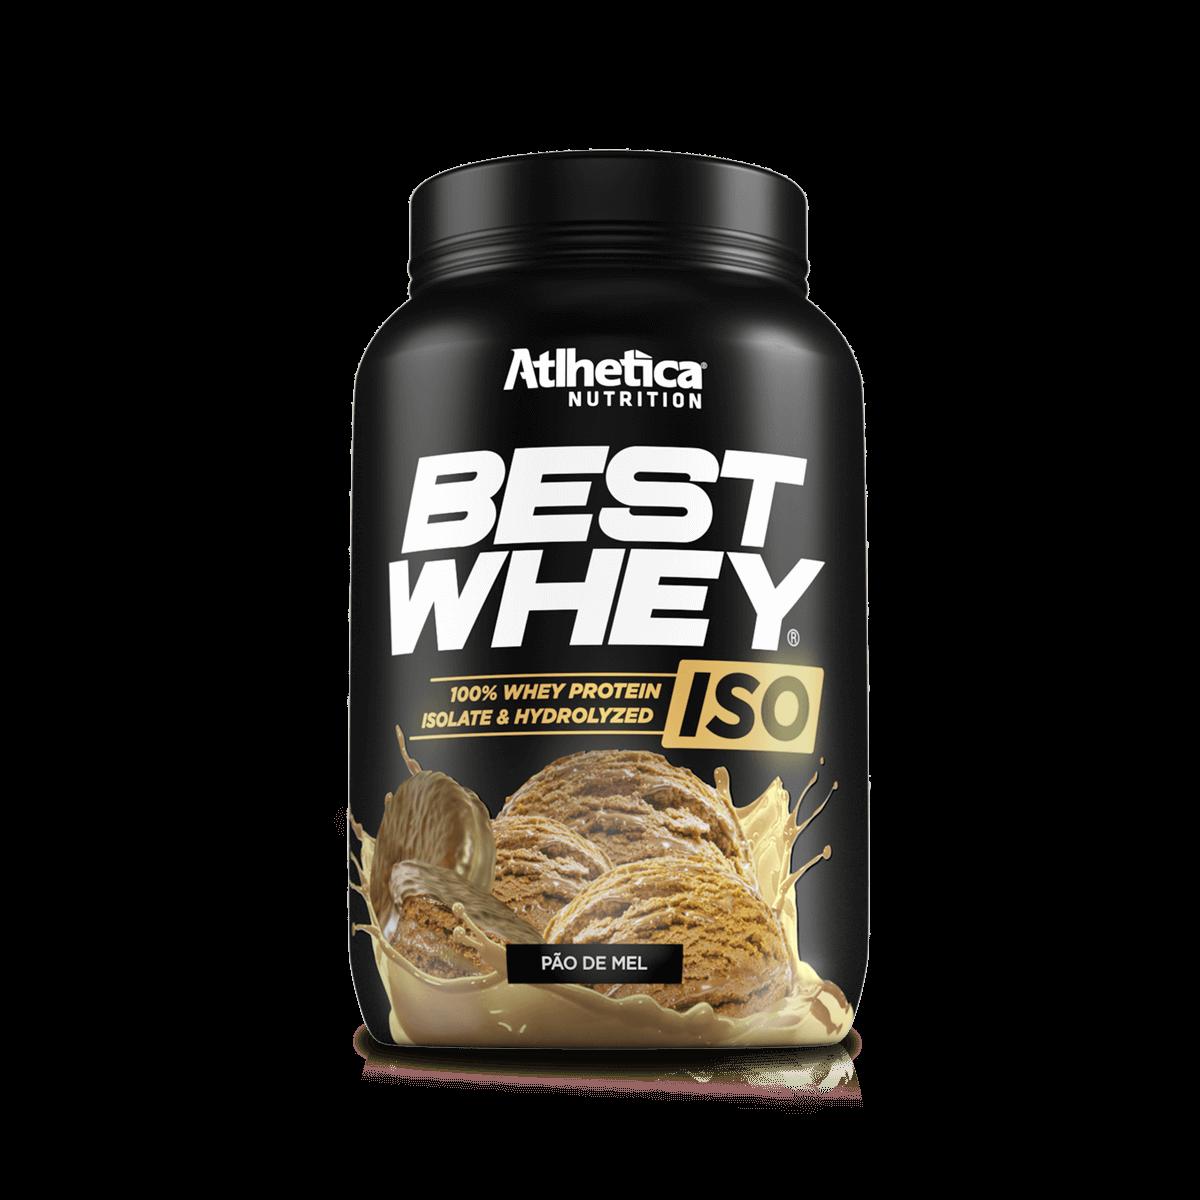 c13166898 Best Whey ISO (900g) Atlhetica Nutrition - Loja do Suplemento